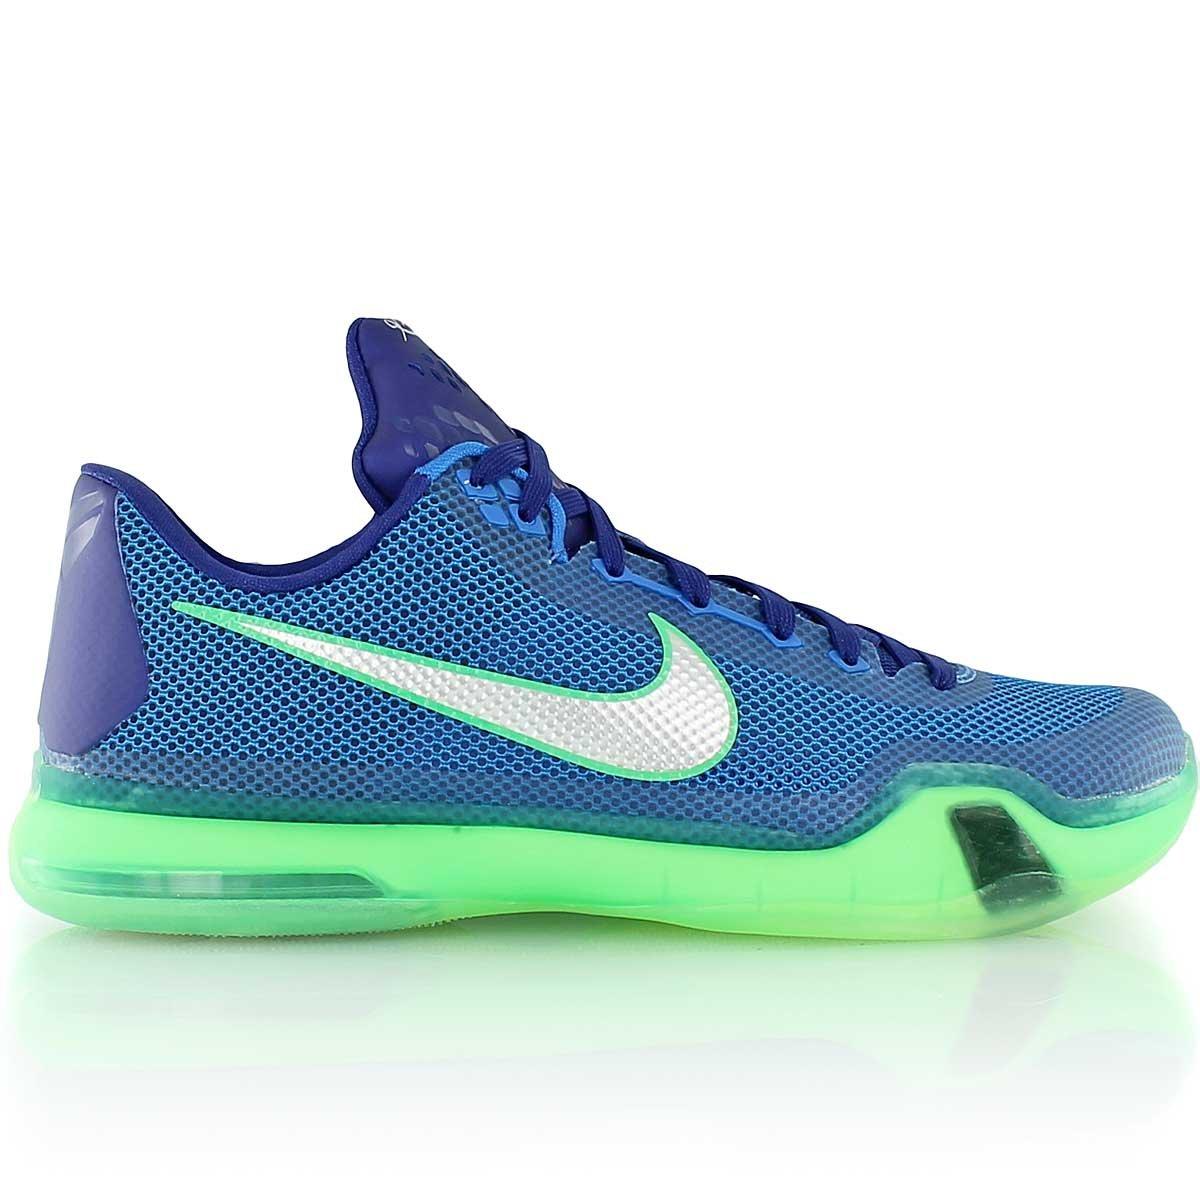 low priced 61944 18af8 Galleon - Nike Mens Kobe X, SOAR  METALLIC SILVER-DEEP ROYAL BLUE-GREEN  SHOCK, 10 M US